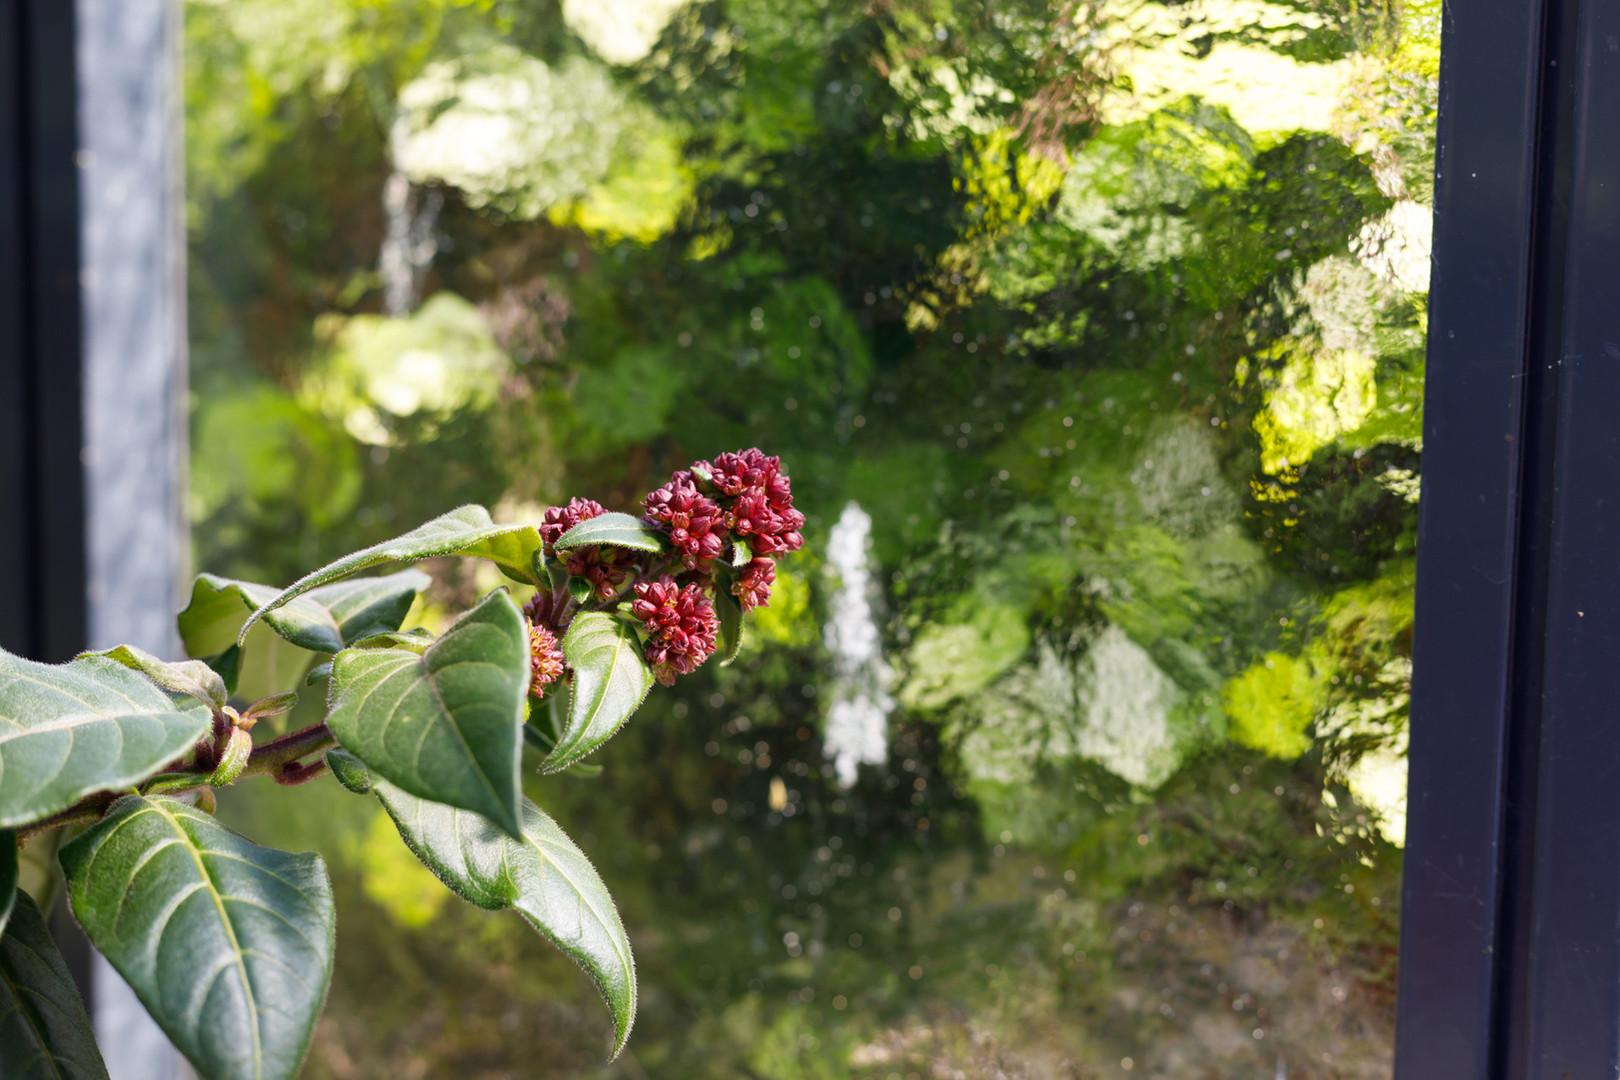 Plantanious   Bedrijfsfotografie   by Liek. & La Fabriek